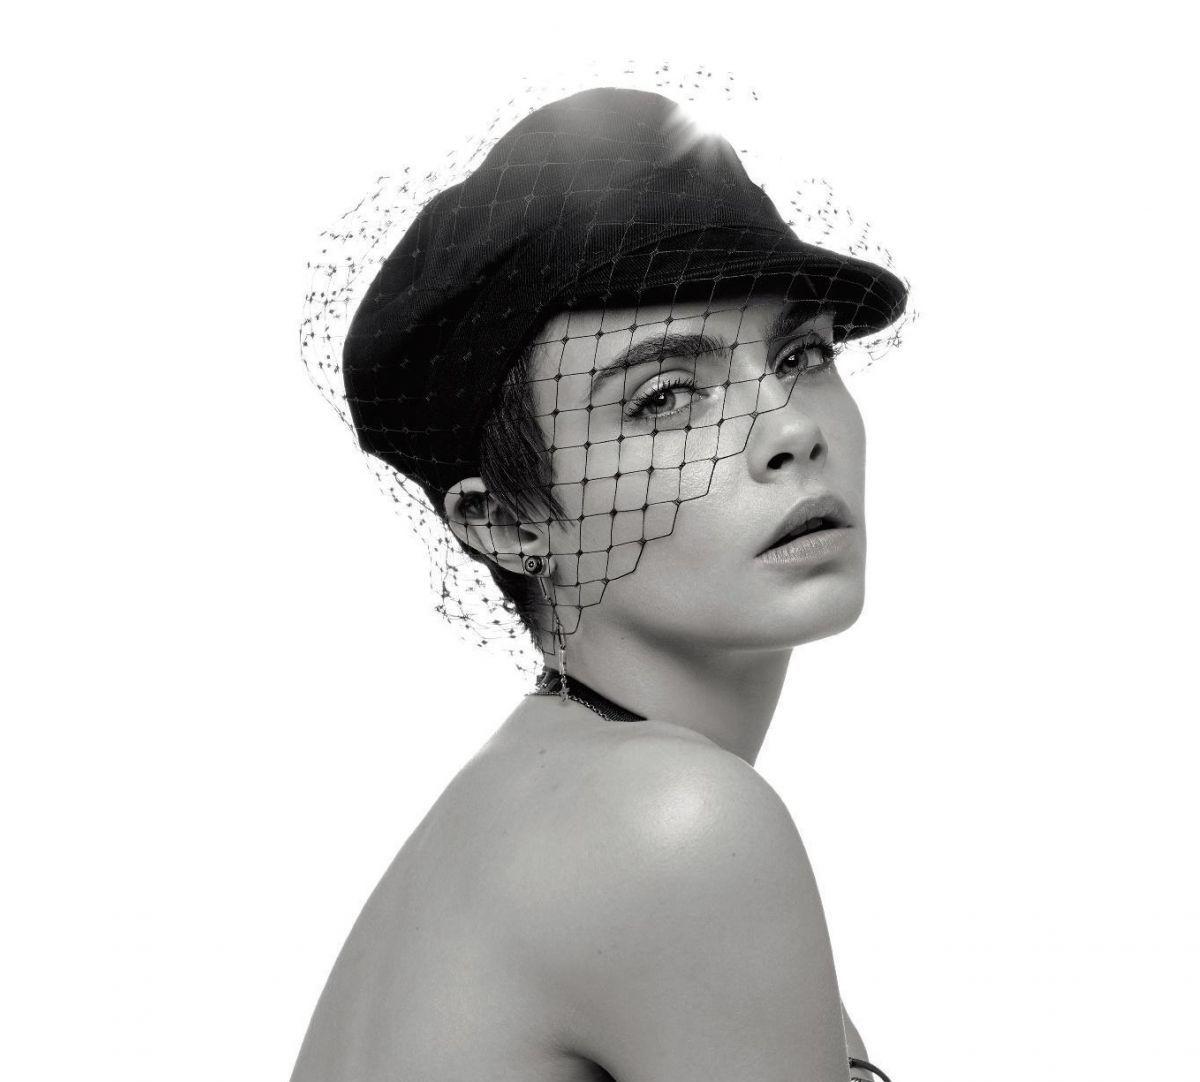 Cara Delevingne In Numero Magazine 190 February 2018 issue